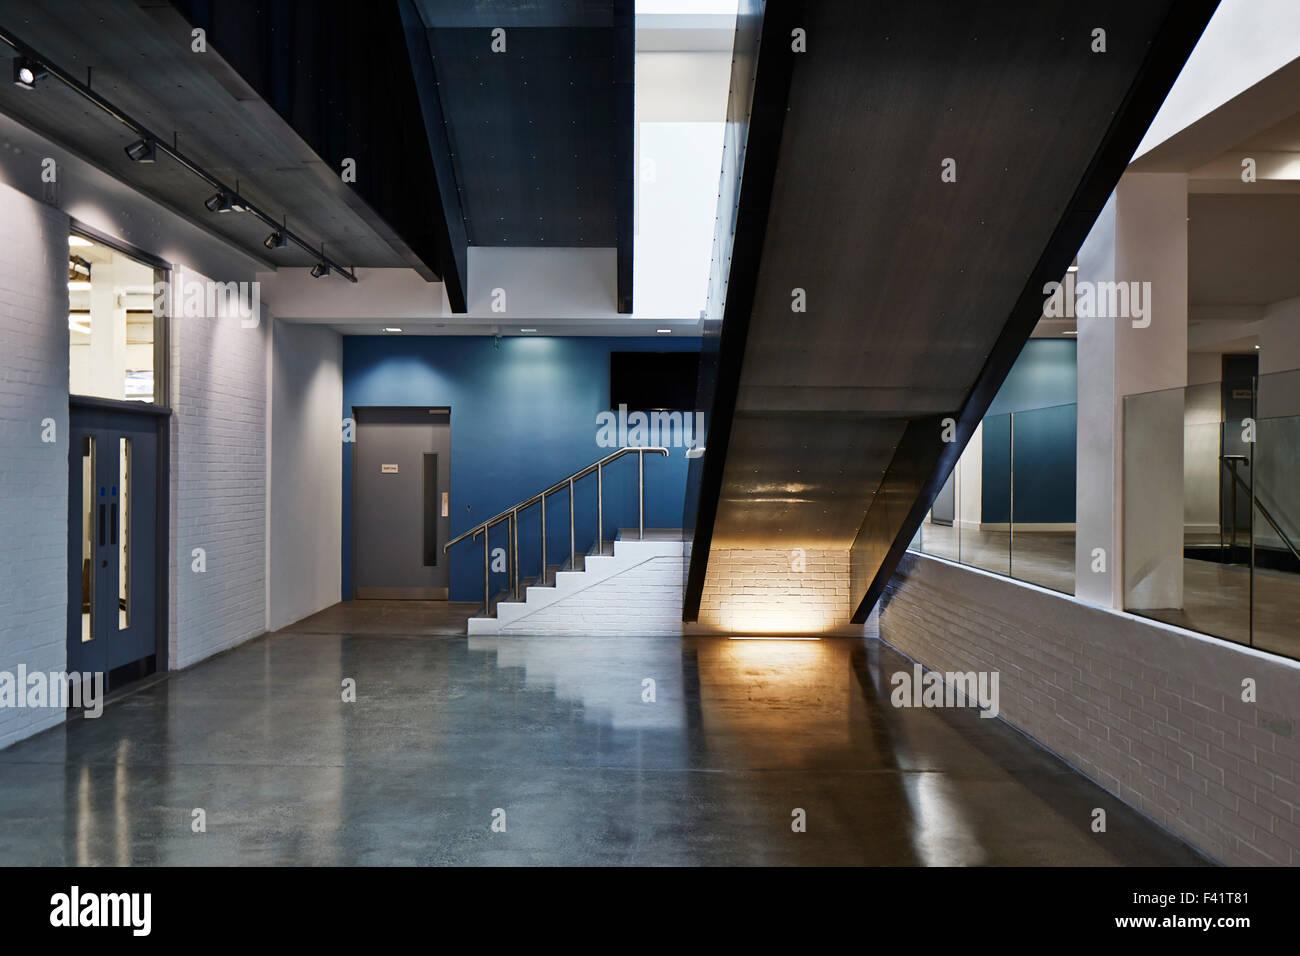 Foyer And Entryways University : Ground floor entrance hall guntons atrium nua norwich